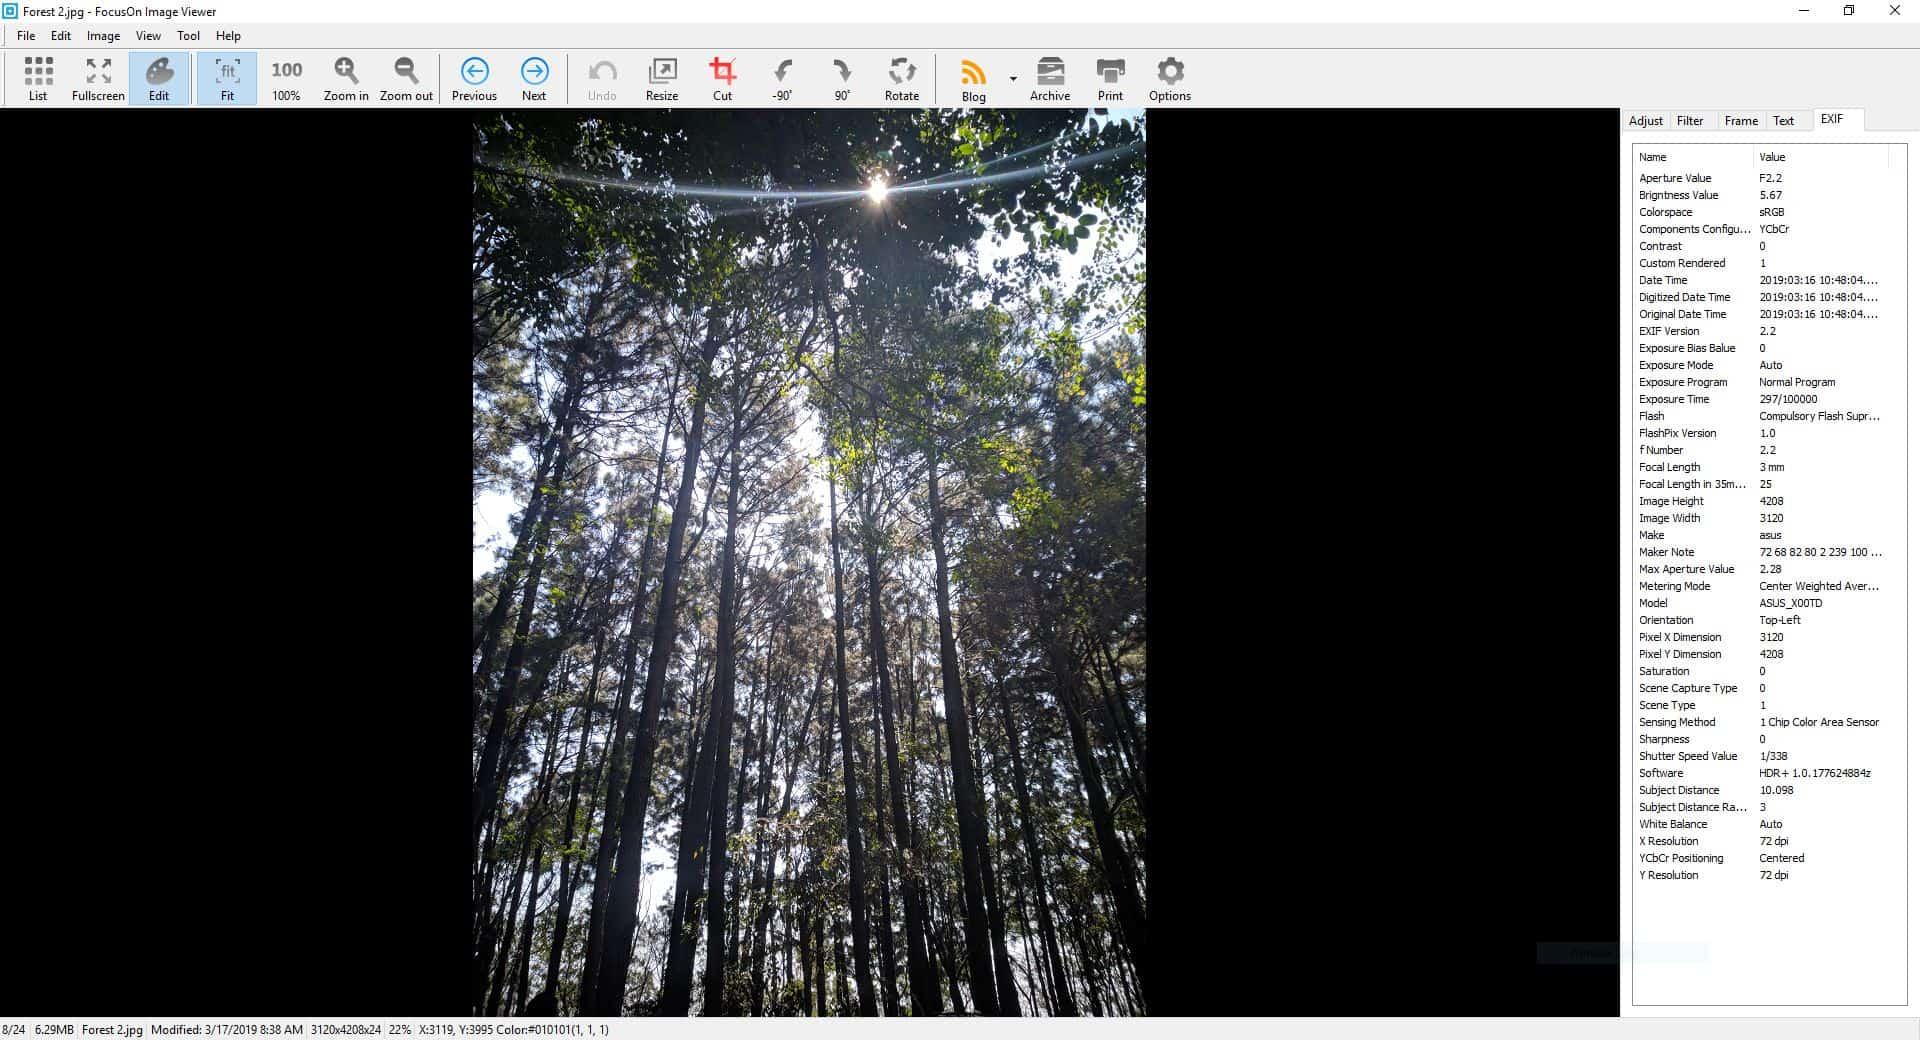 FocusOn Image Viewer editor